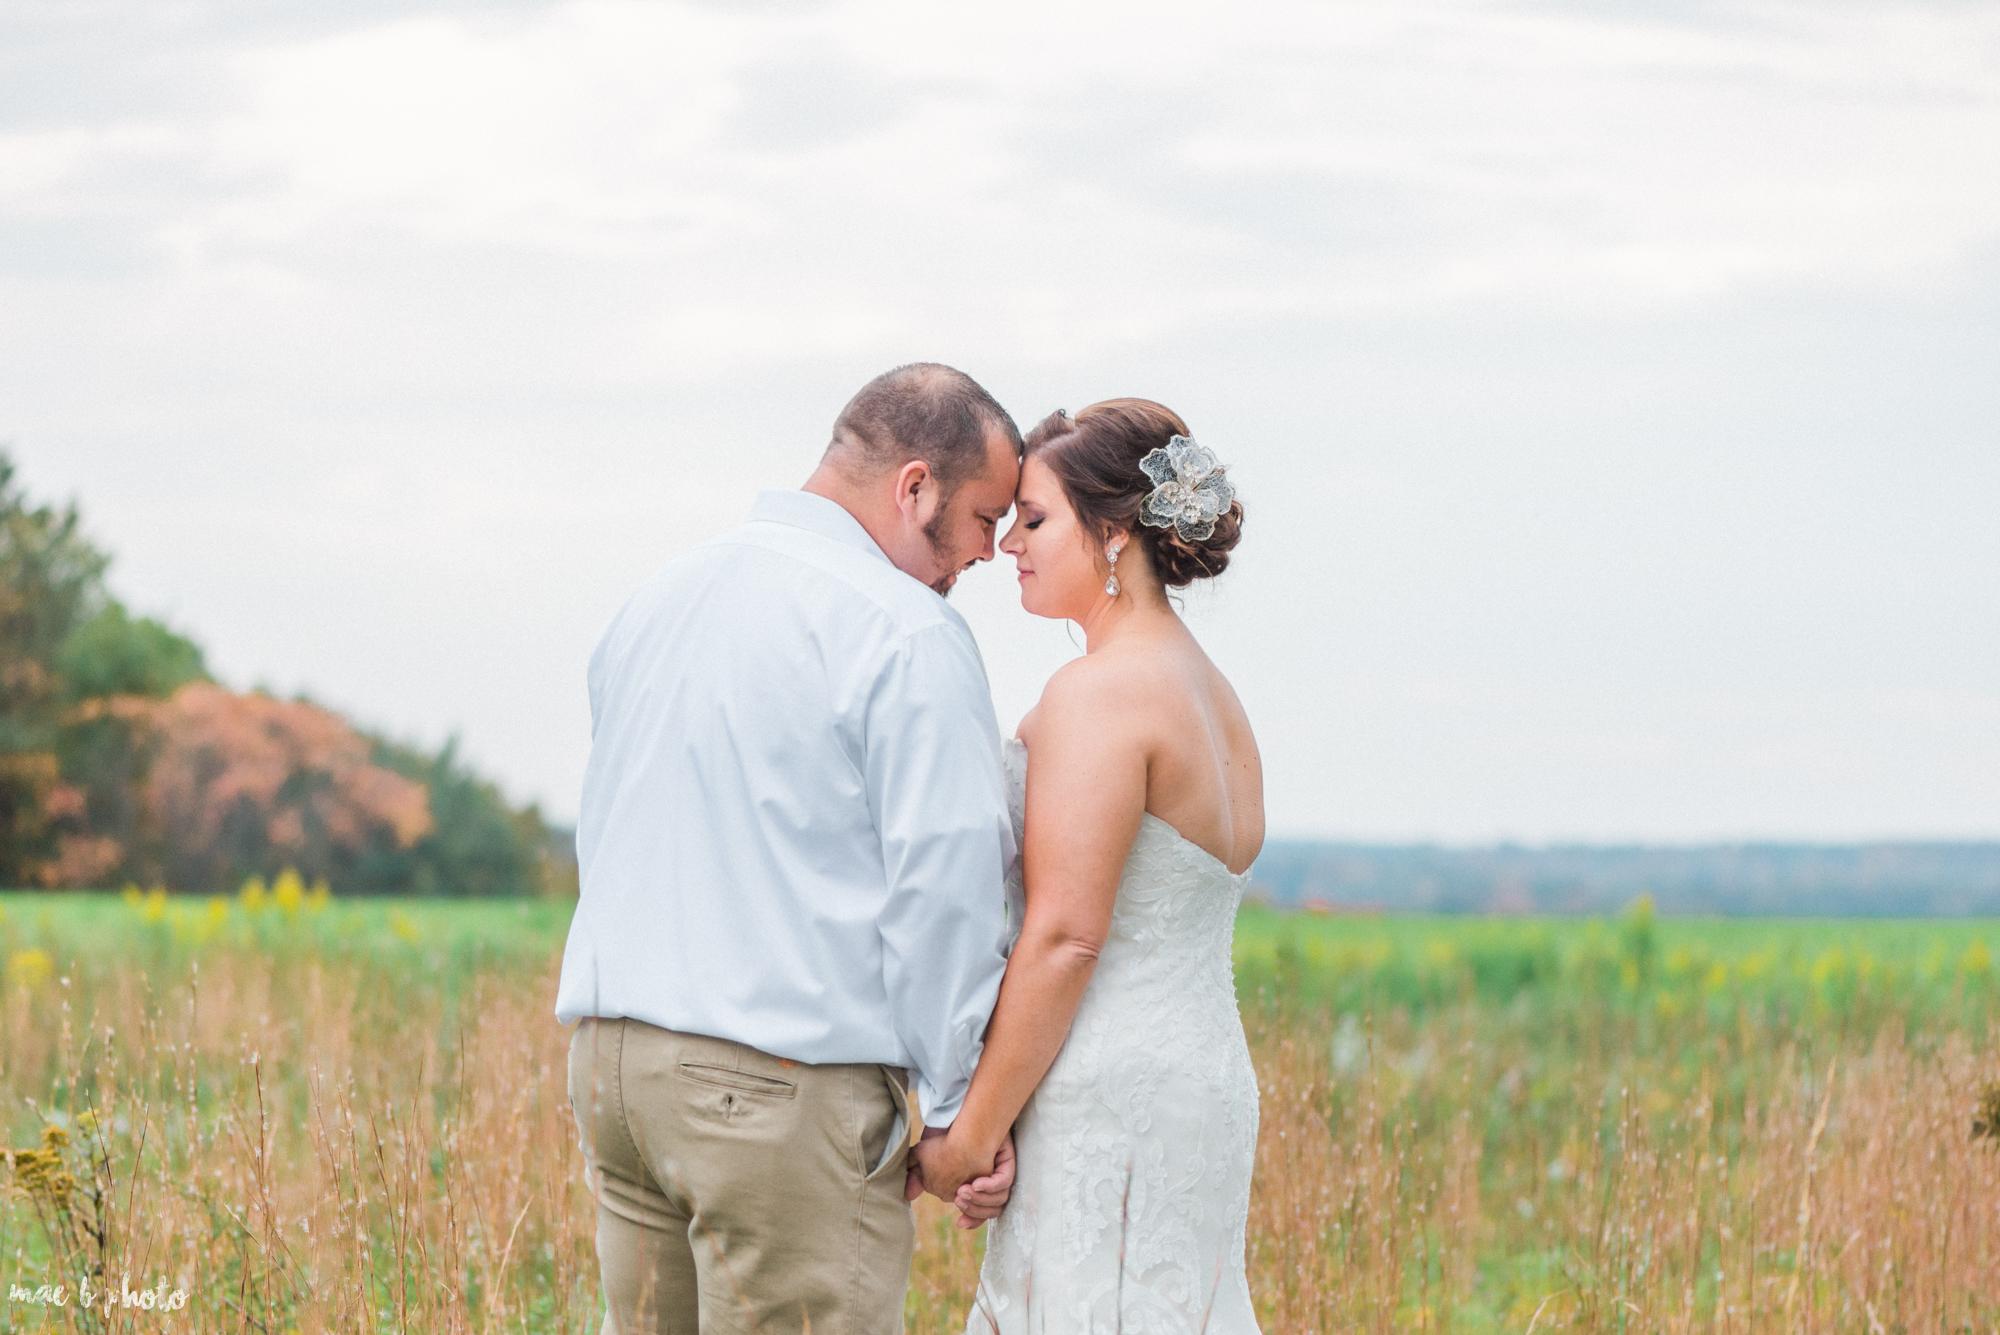 Sarah & Dustin's Rustic Chic Barn Wedding at Hartford Hill Winery in Hartford, Ohio by Mae B Photo-75.jpg